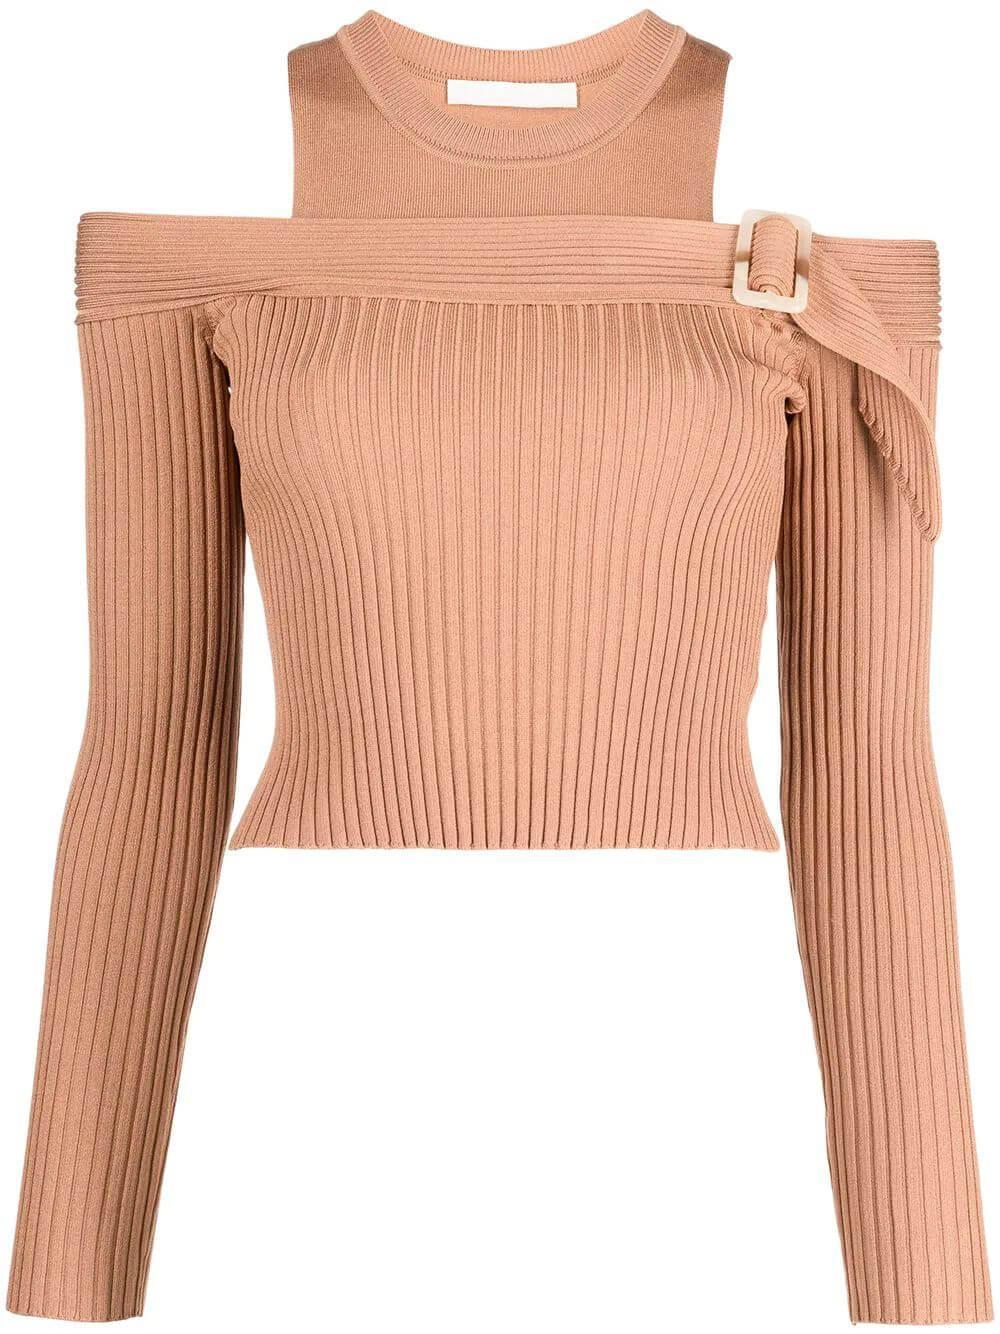 Mandy Knit Top Item # 421-2029-K